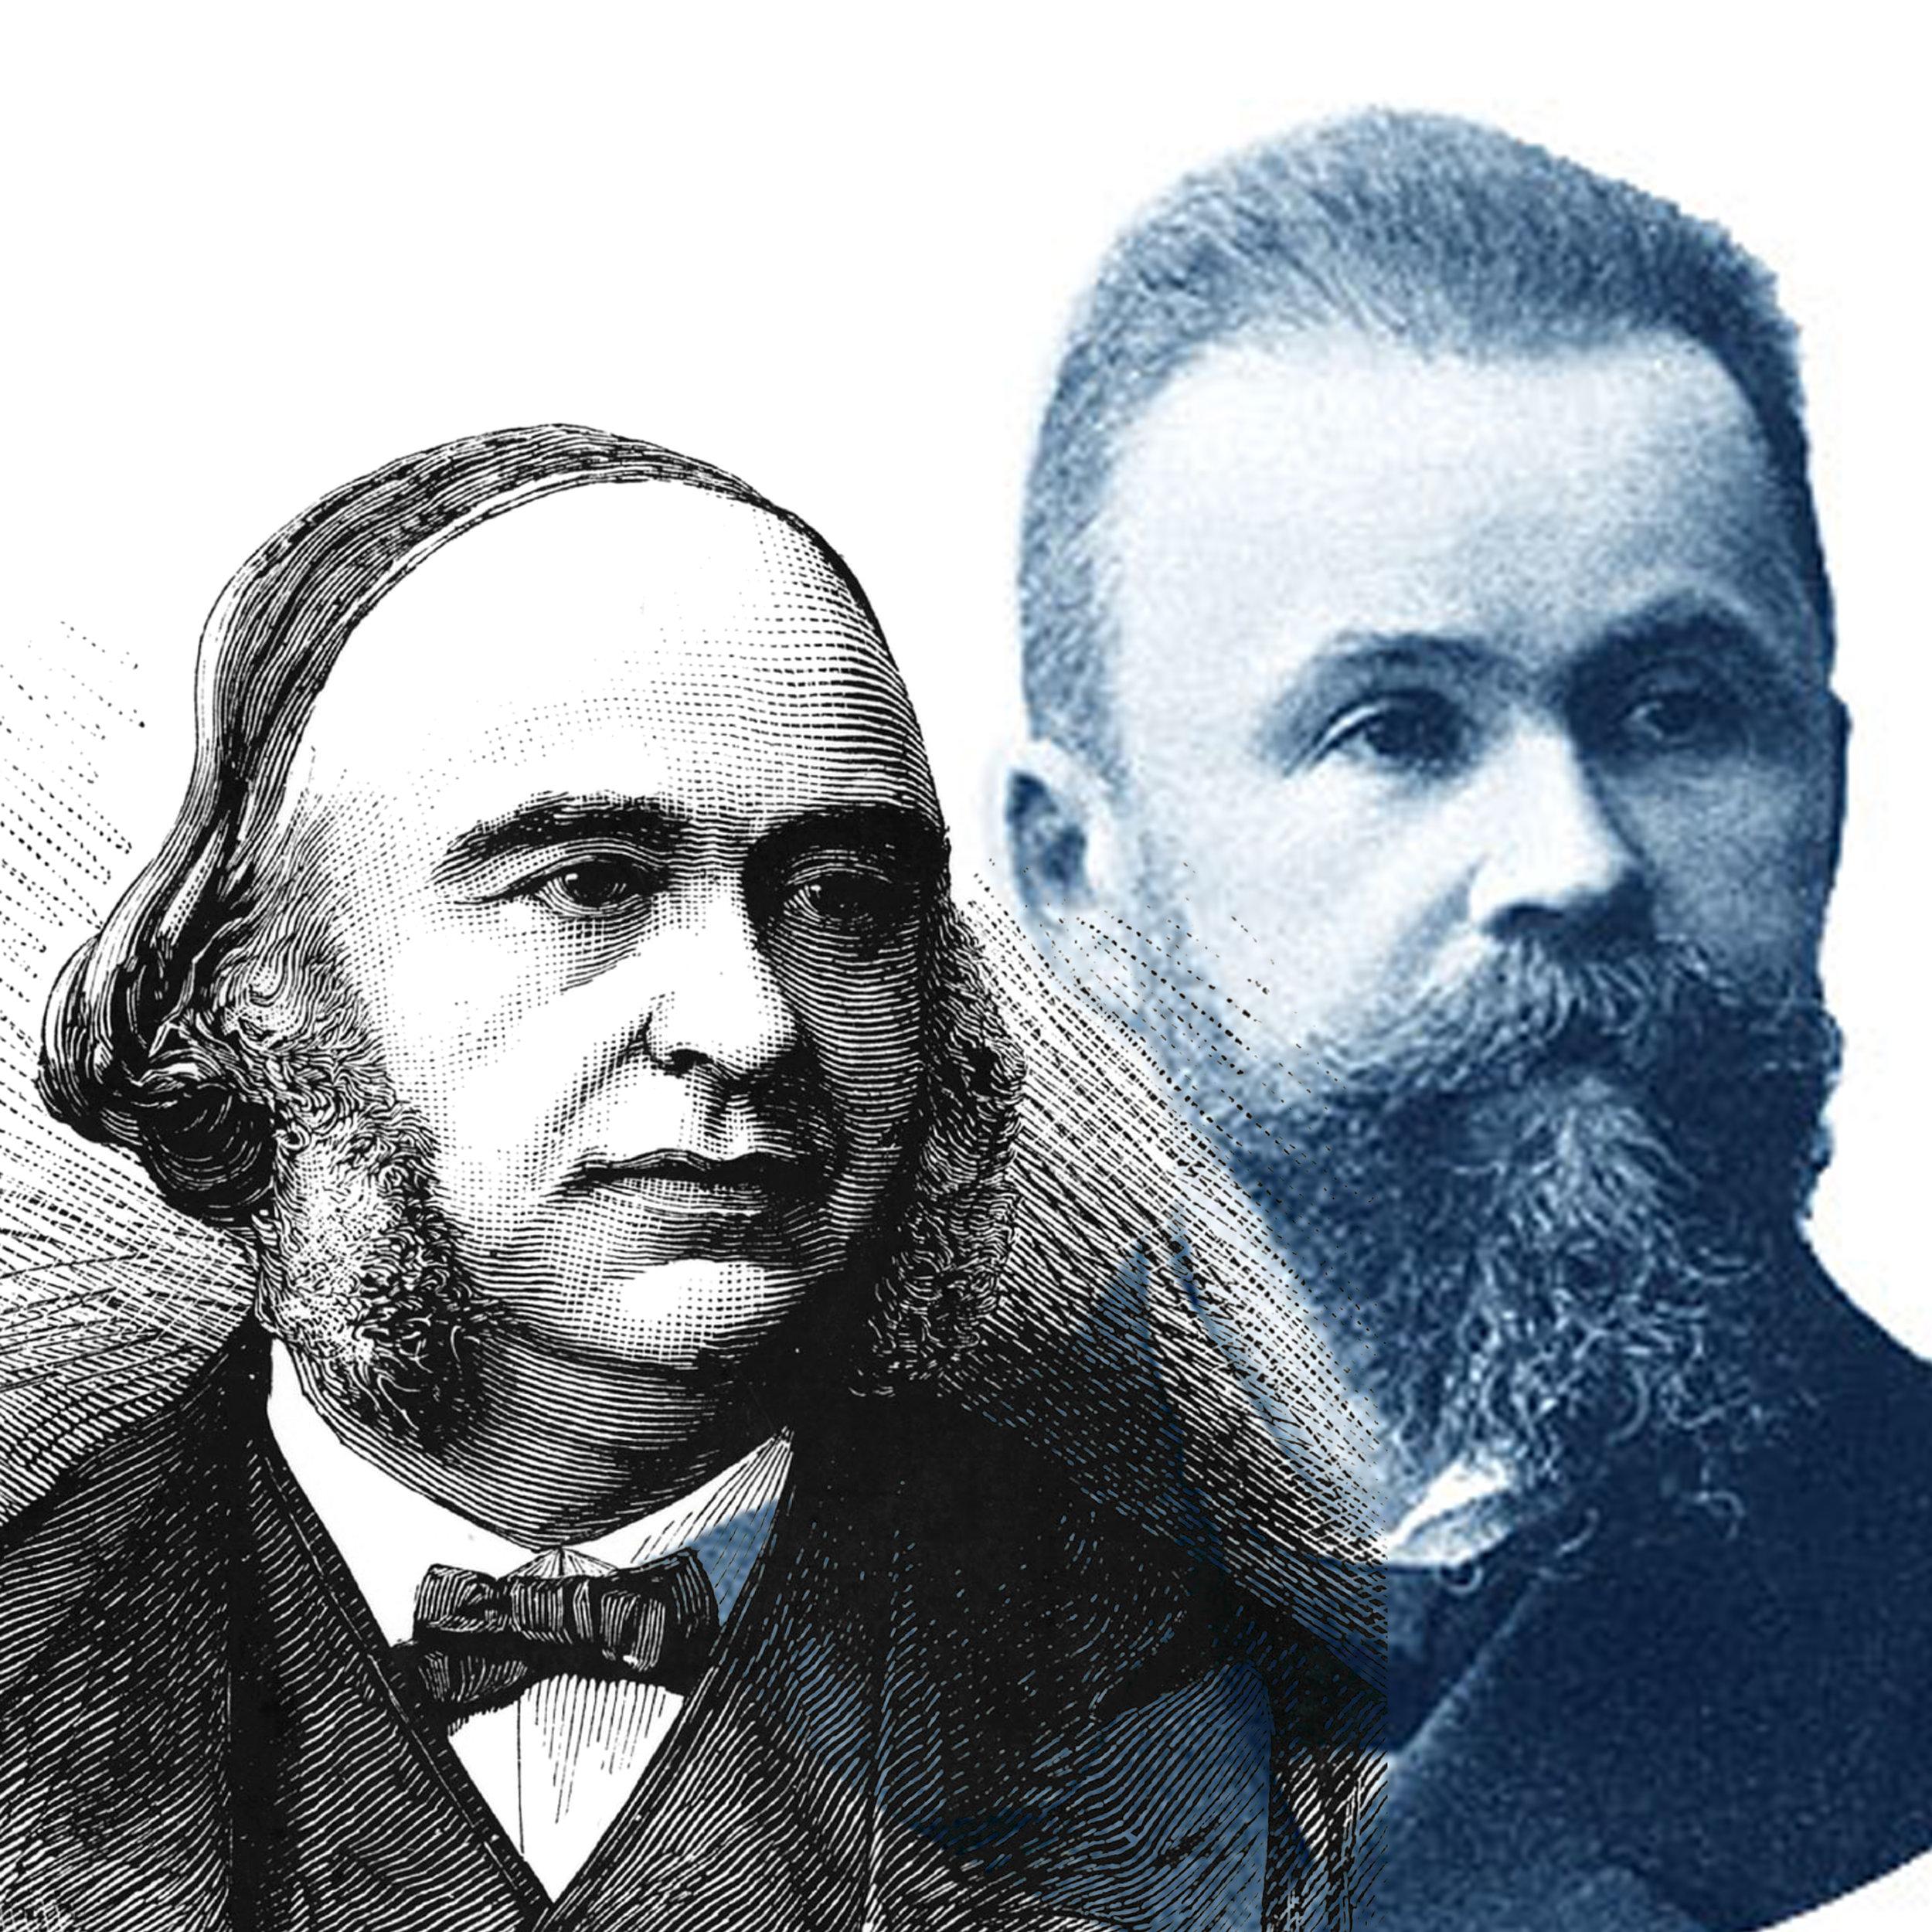 Paul Broca and Carl Wernicke